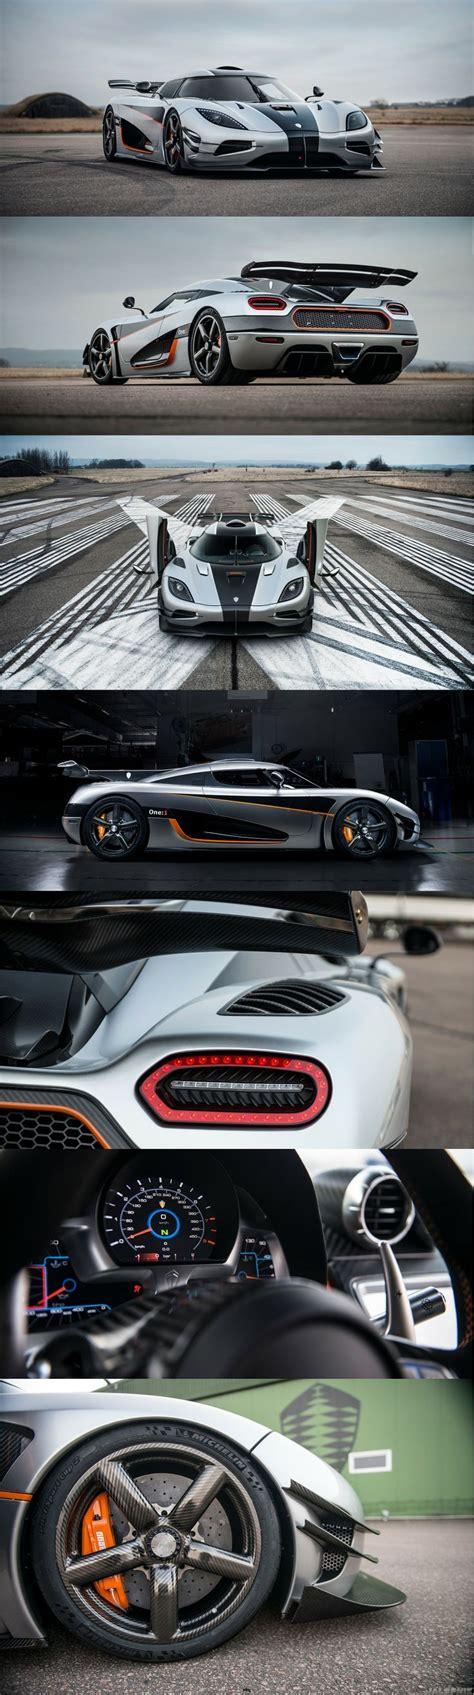 koenigsegg concept car best 10 super fast cars ideas on pinterest fast cars